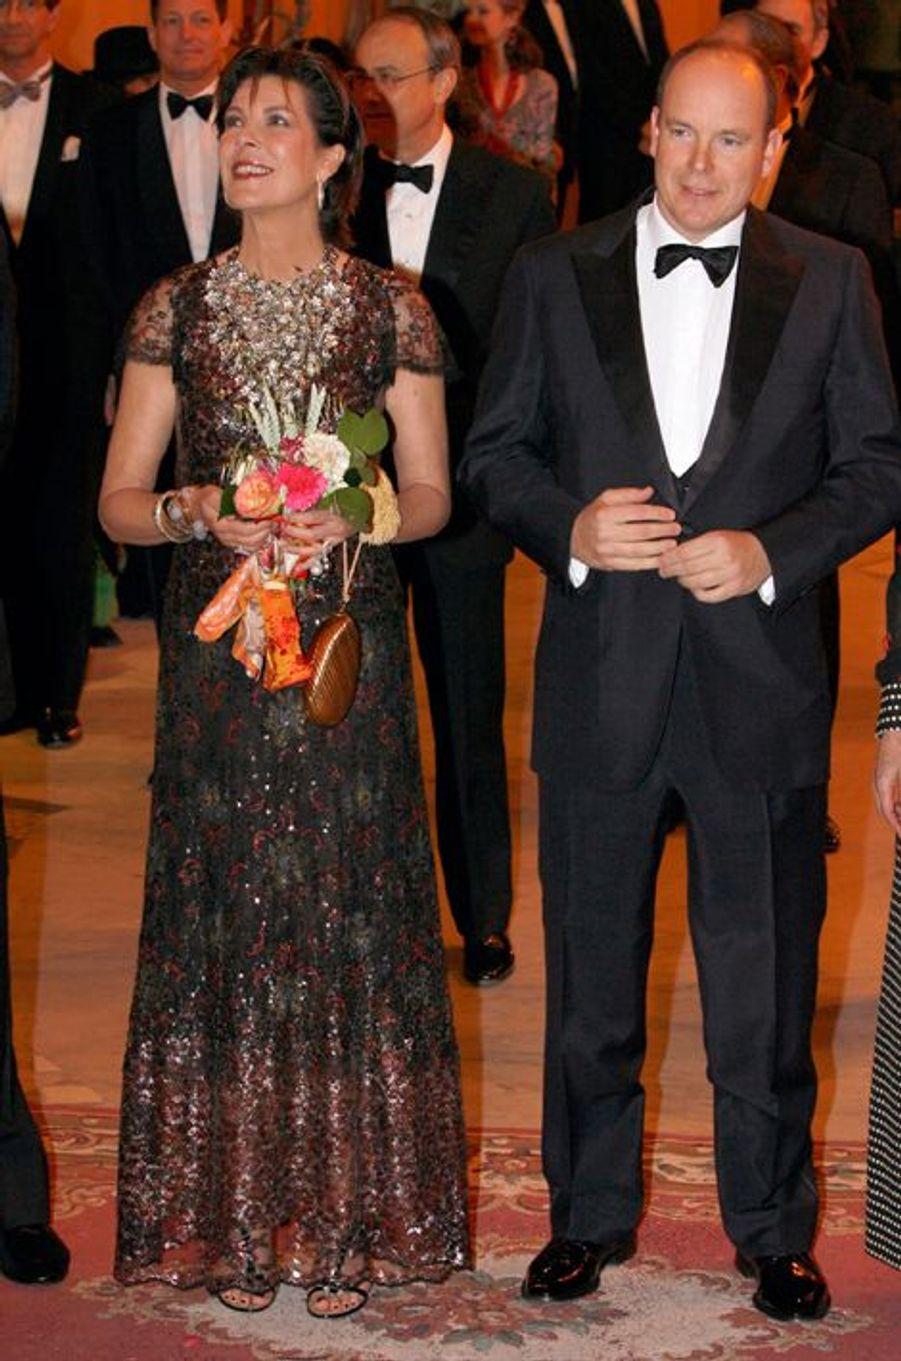 La princesse Caroline de Monaco au bal de la Rose 2007, avec le prince Albert II